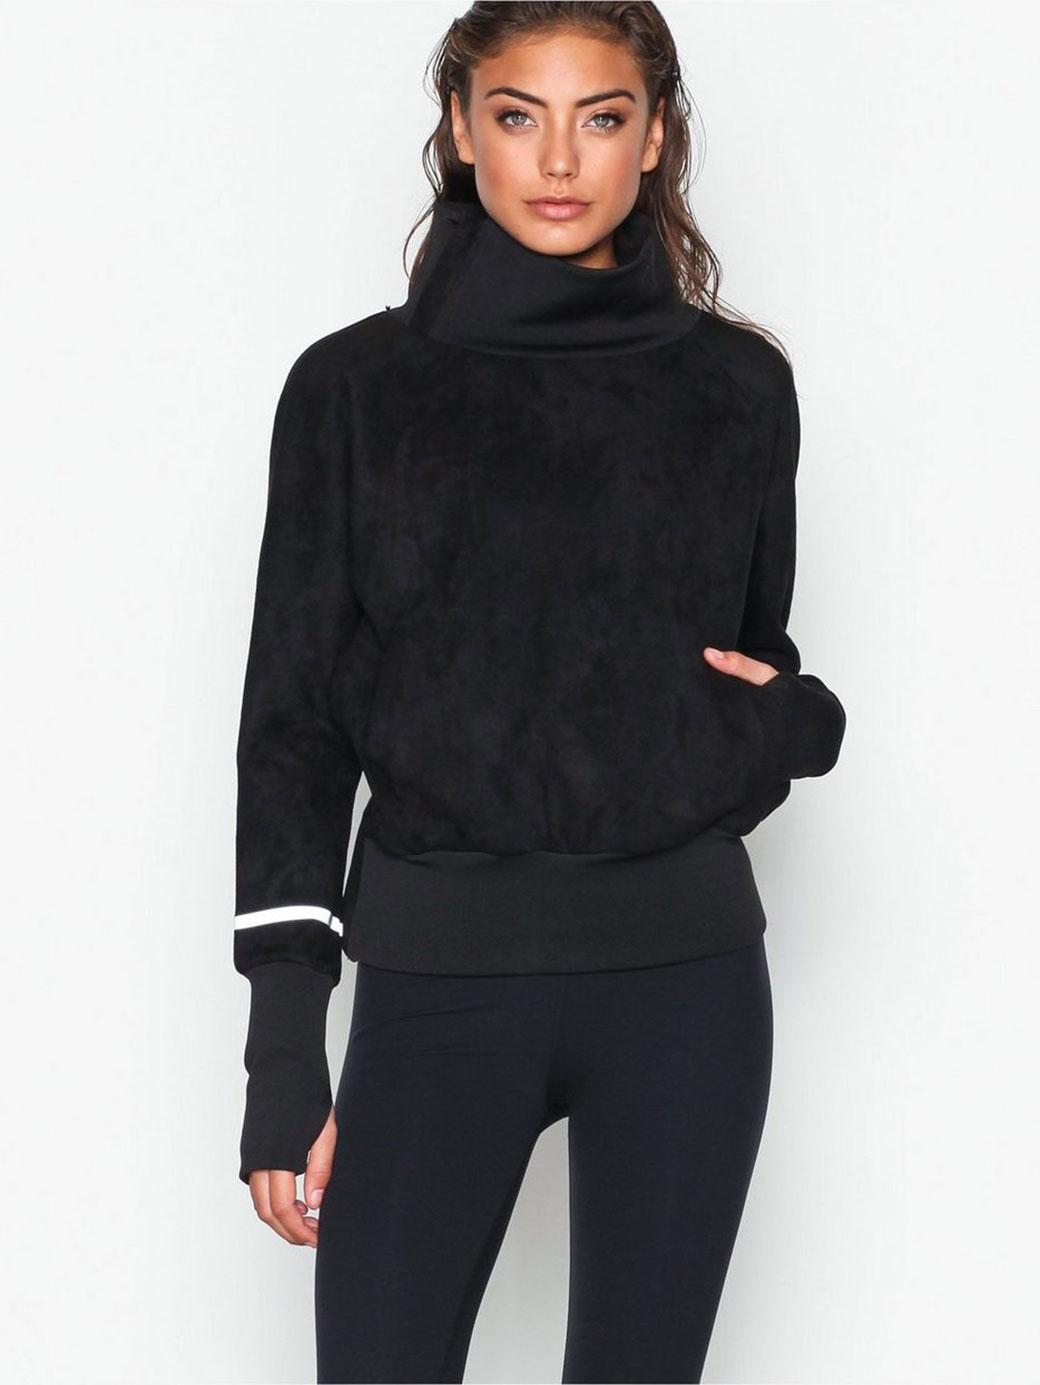 Fashionablefit Jumper 8